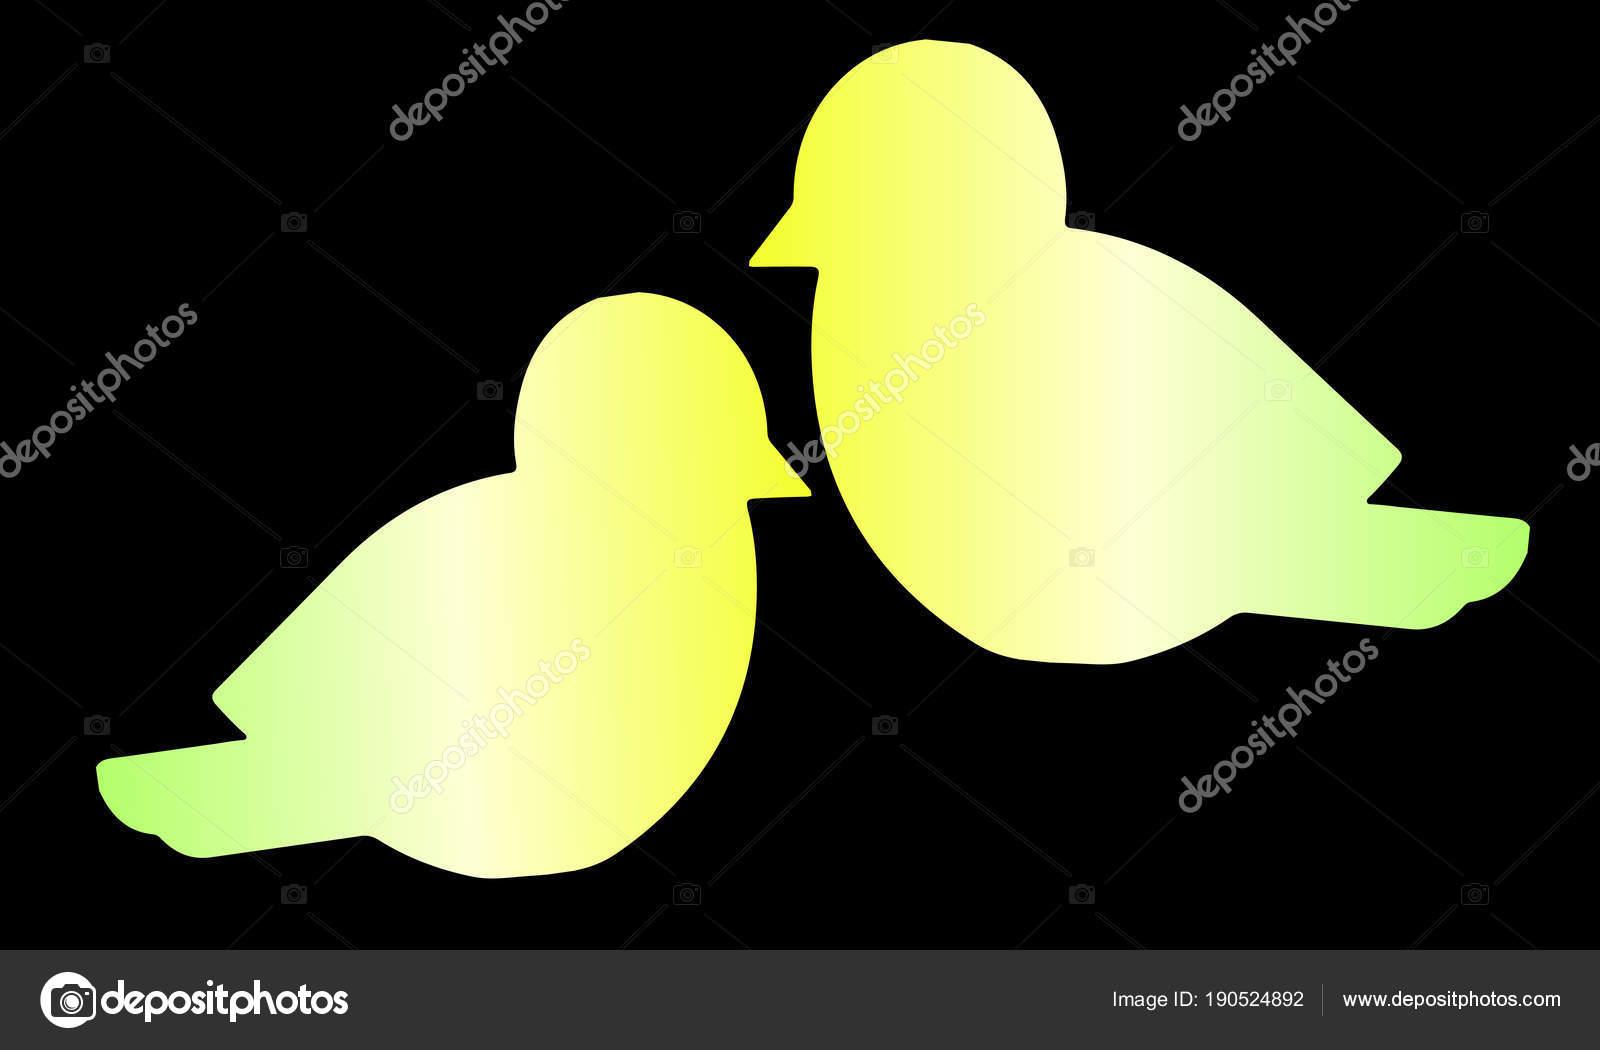 dois pássaros gradientes amarelos silhouette close vetor gradiente